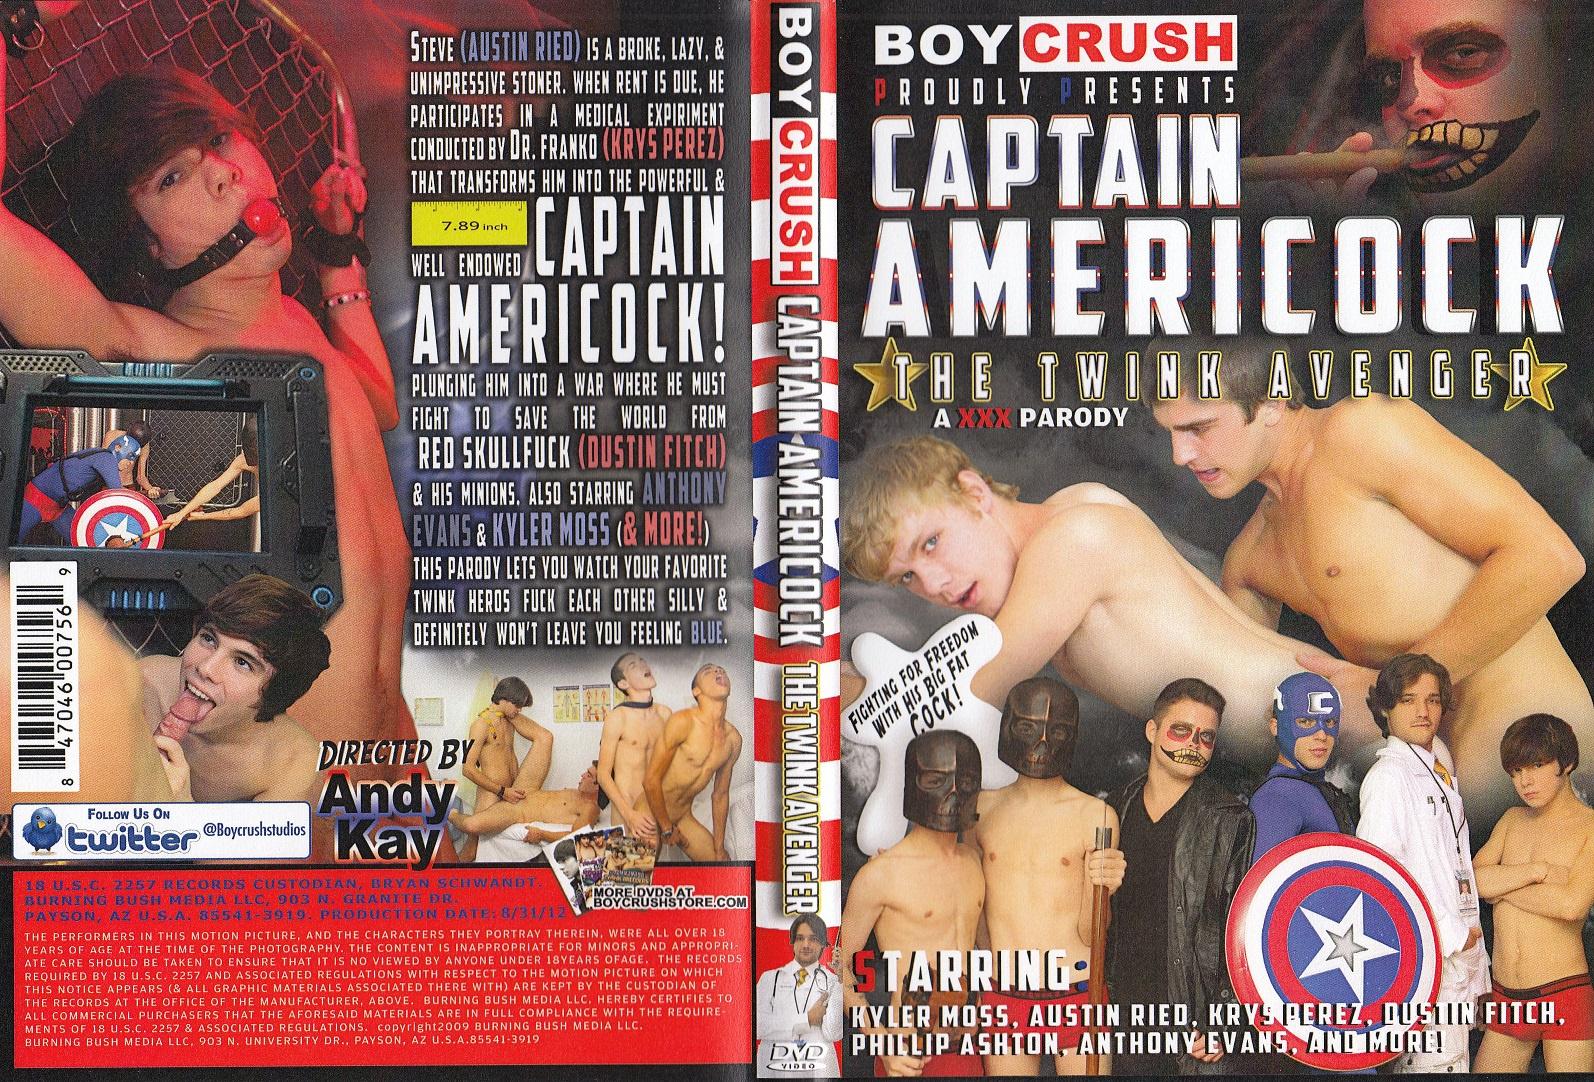 Ch 148:  Captain Americock